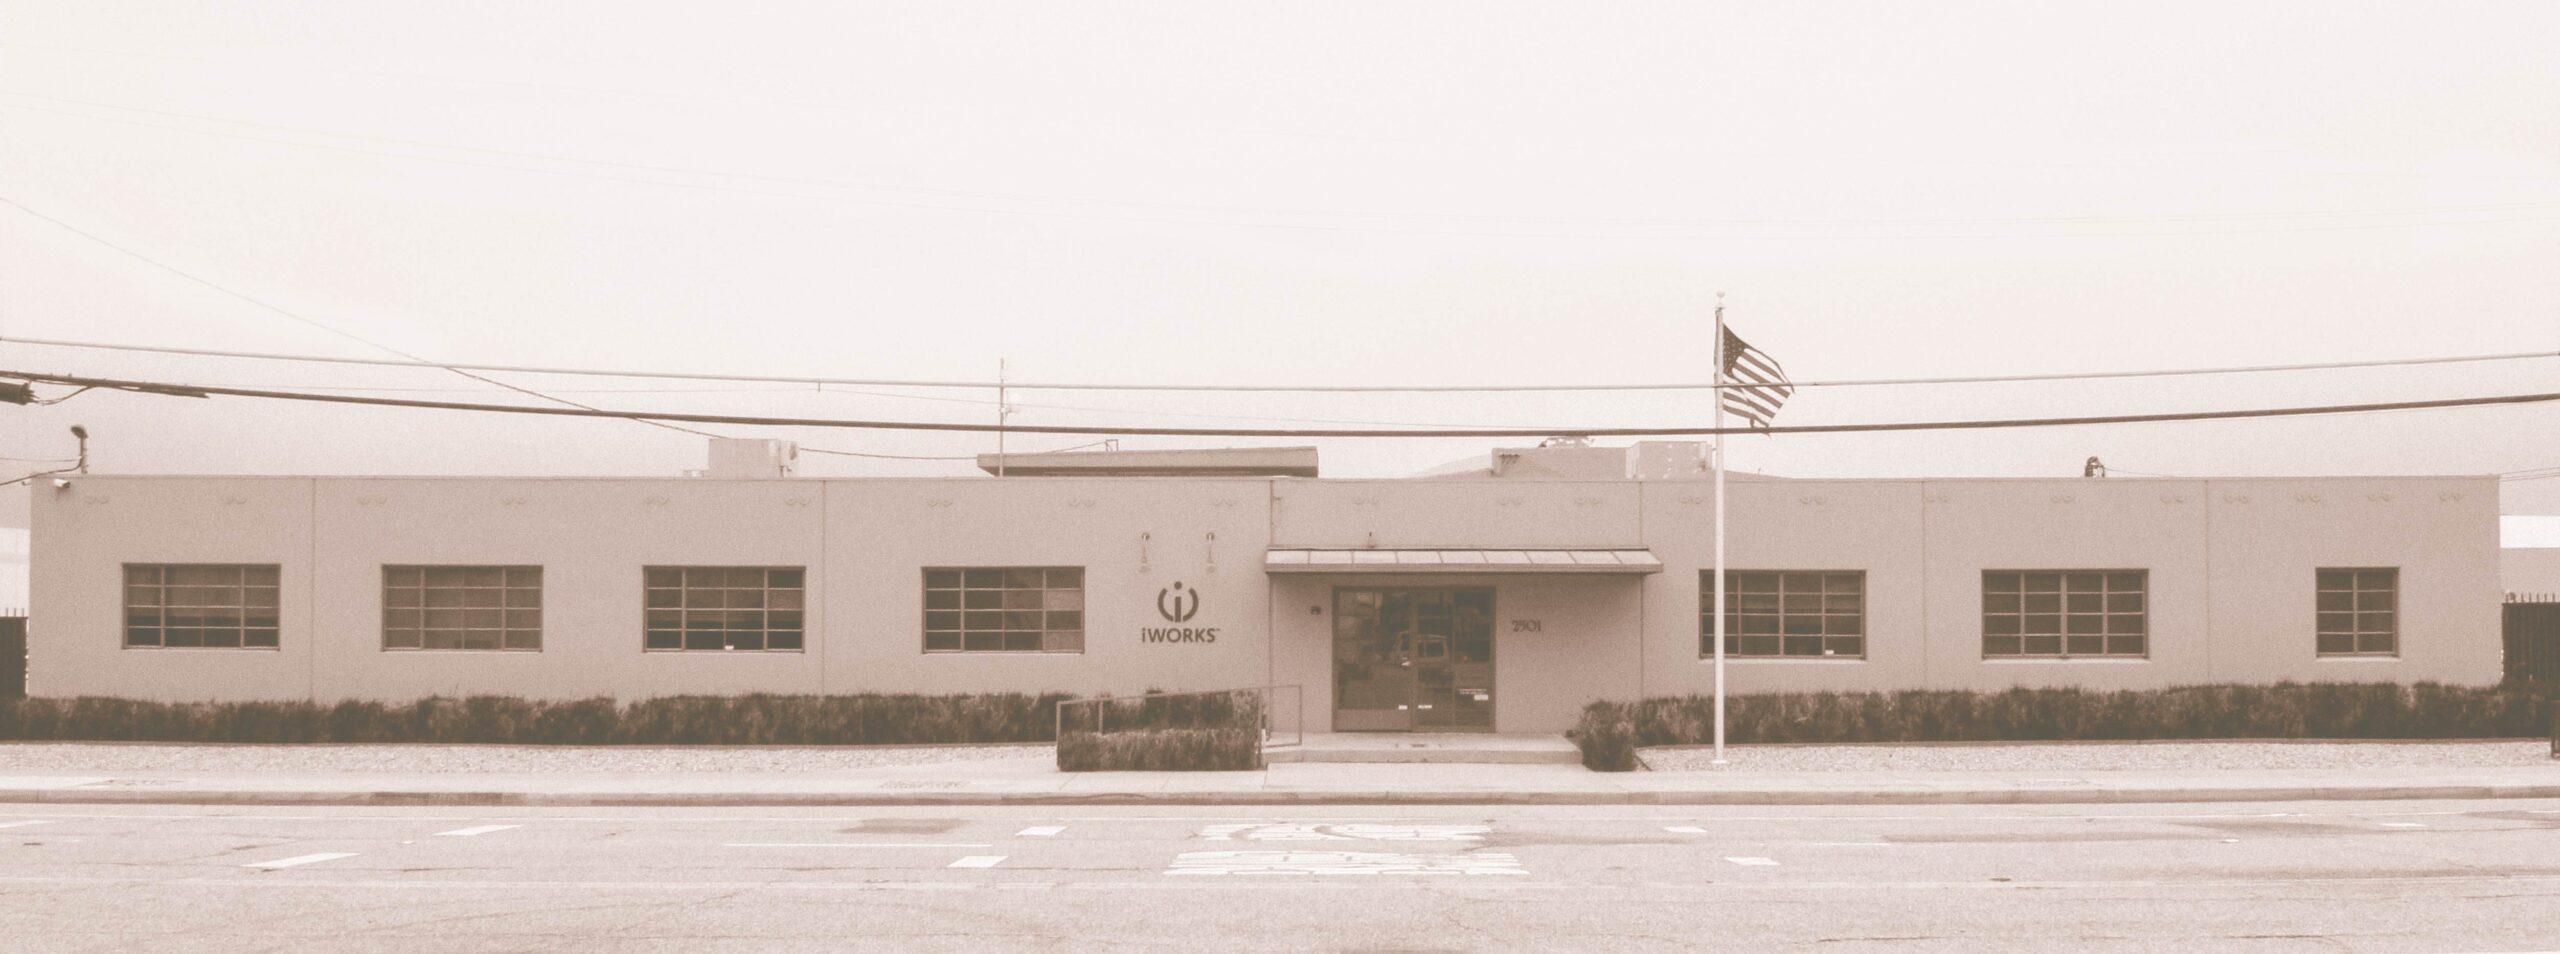 iWorks factory image